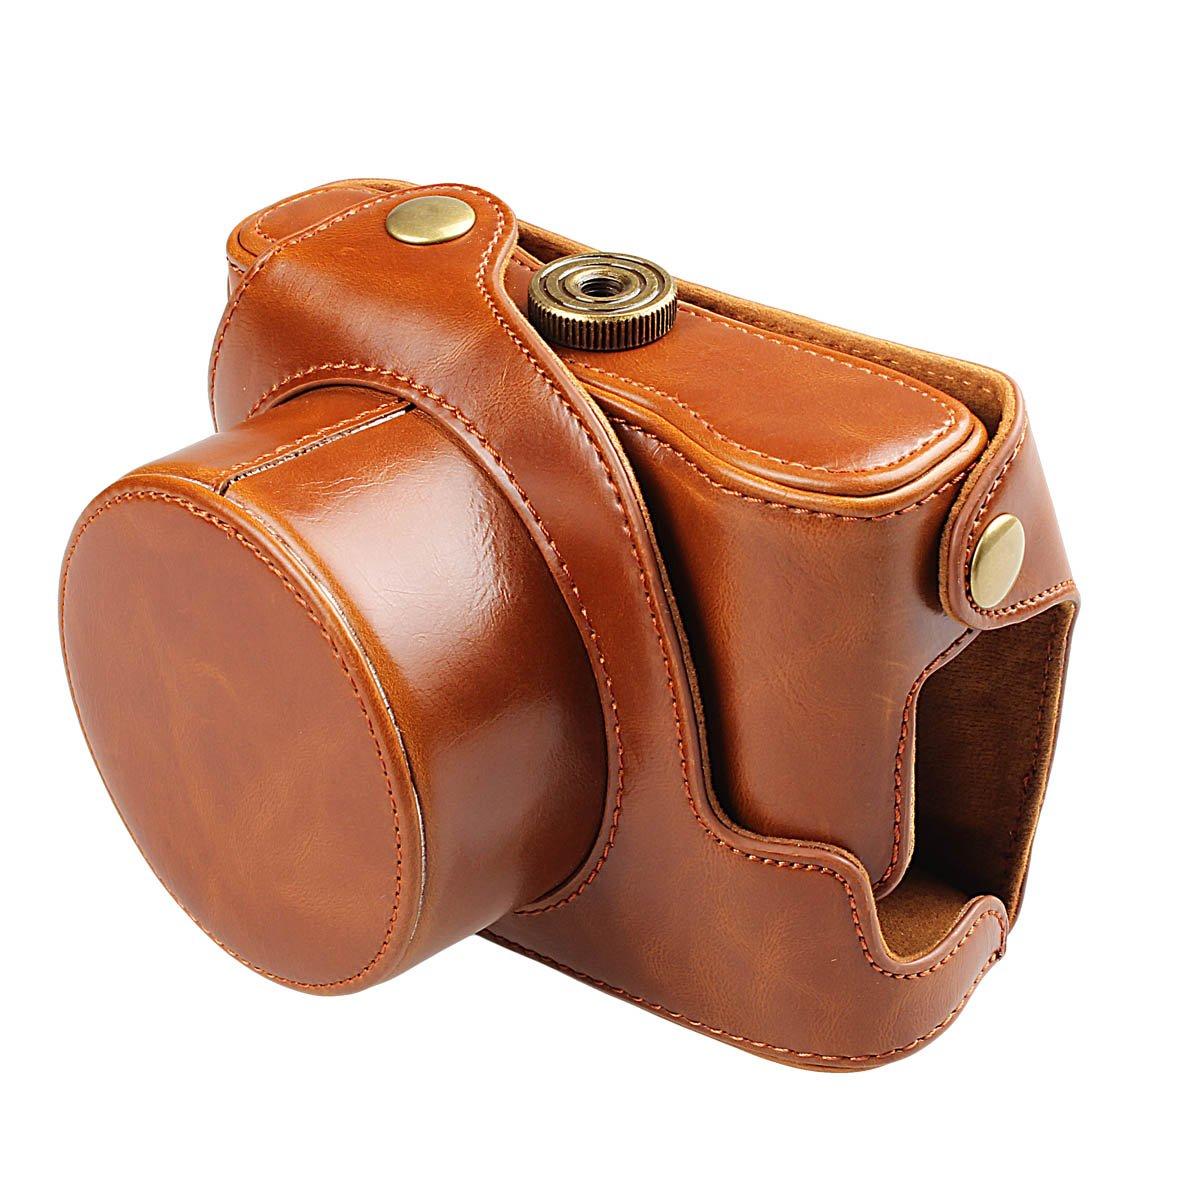 xhorizon TM FLK Black Protective Leather Camera Case, Bag Case for Canon PowerShot G1X Mark II Digital Camera 201502061432H